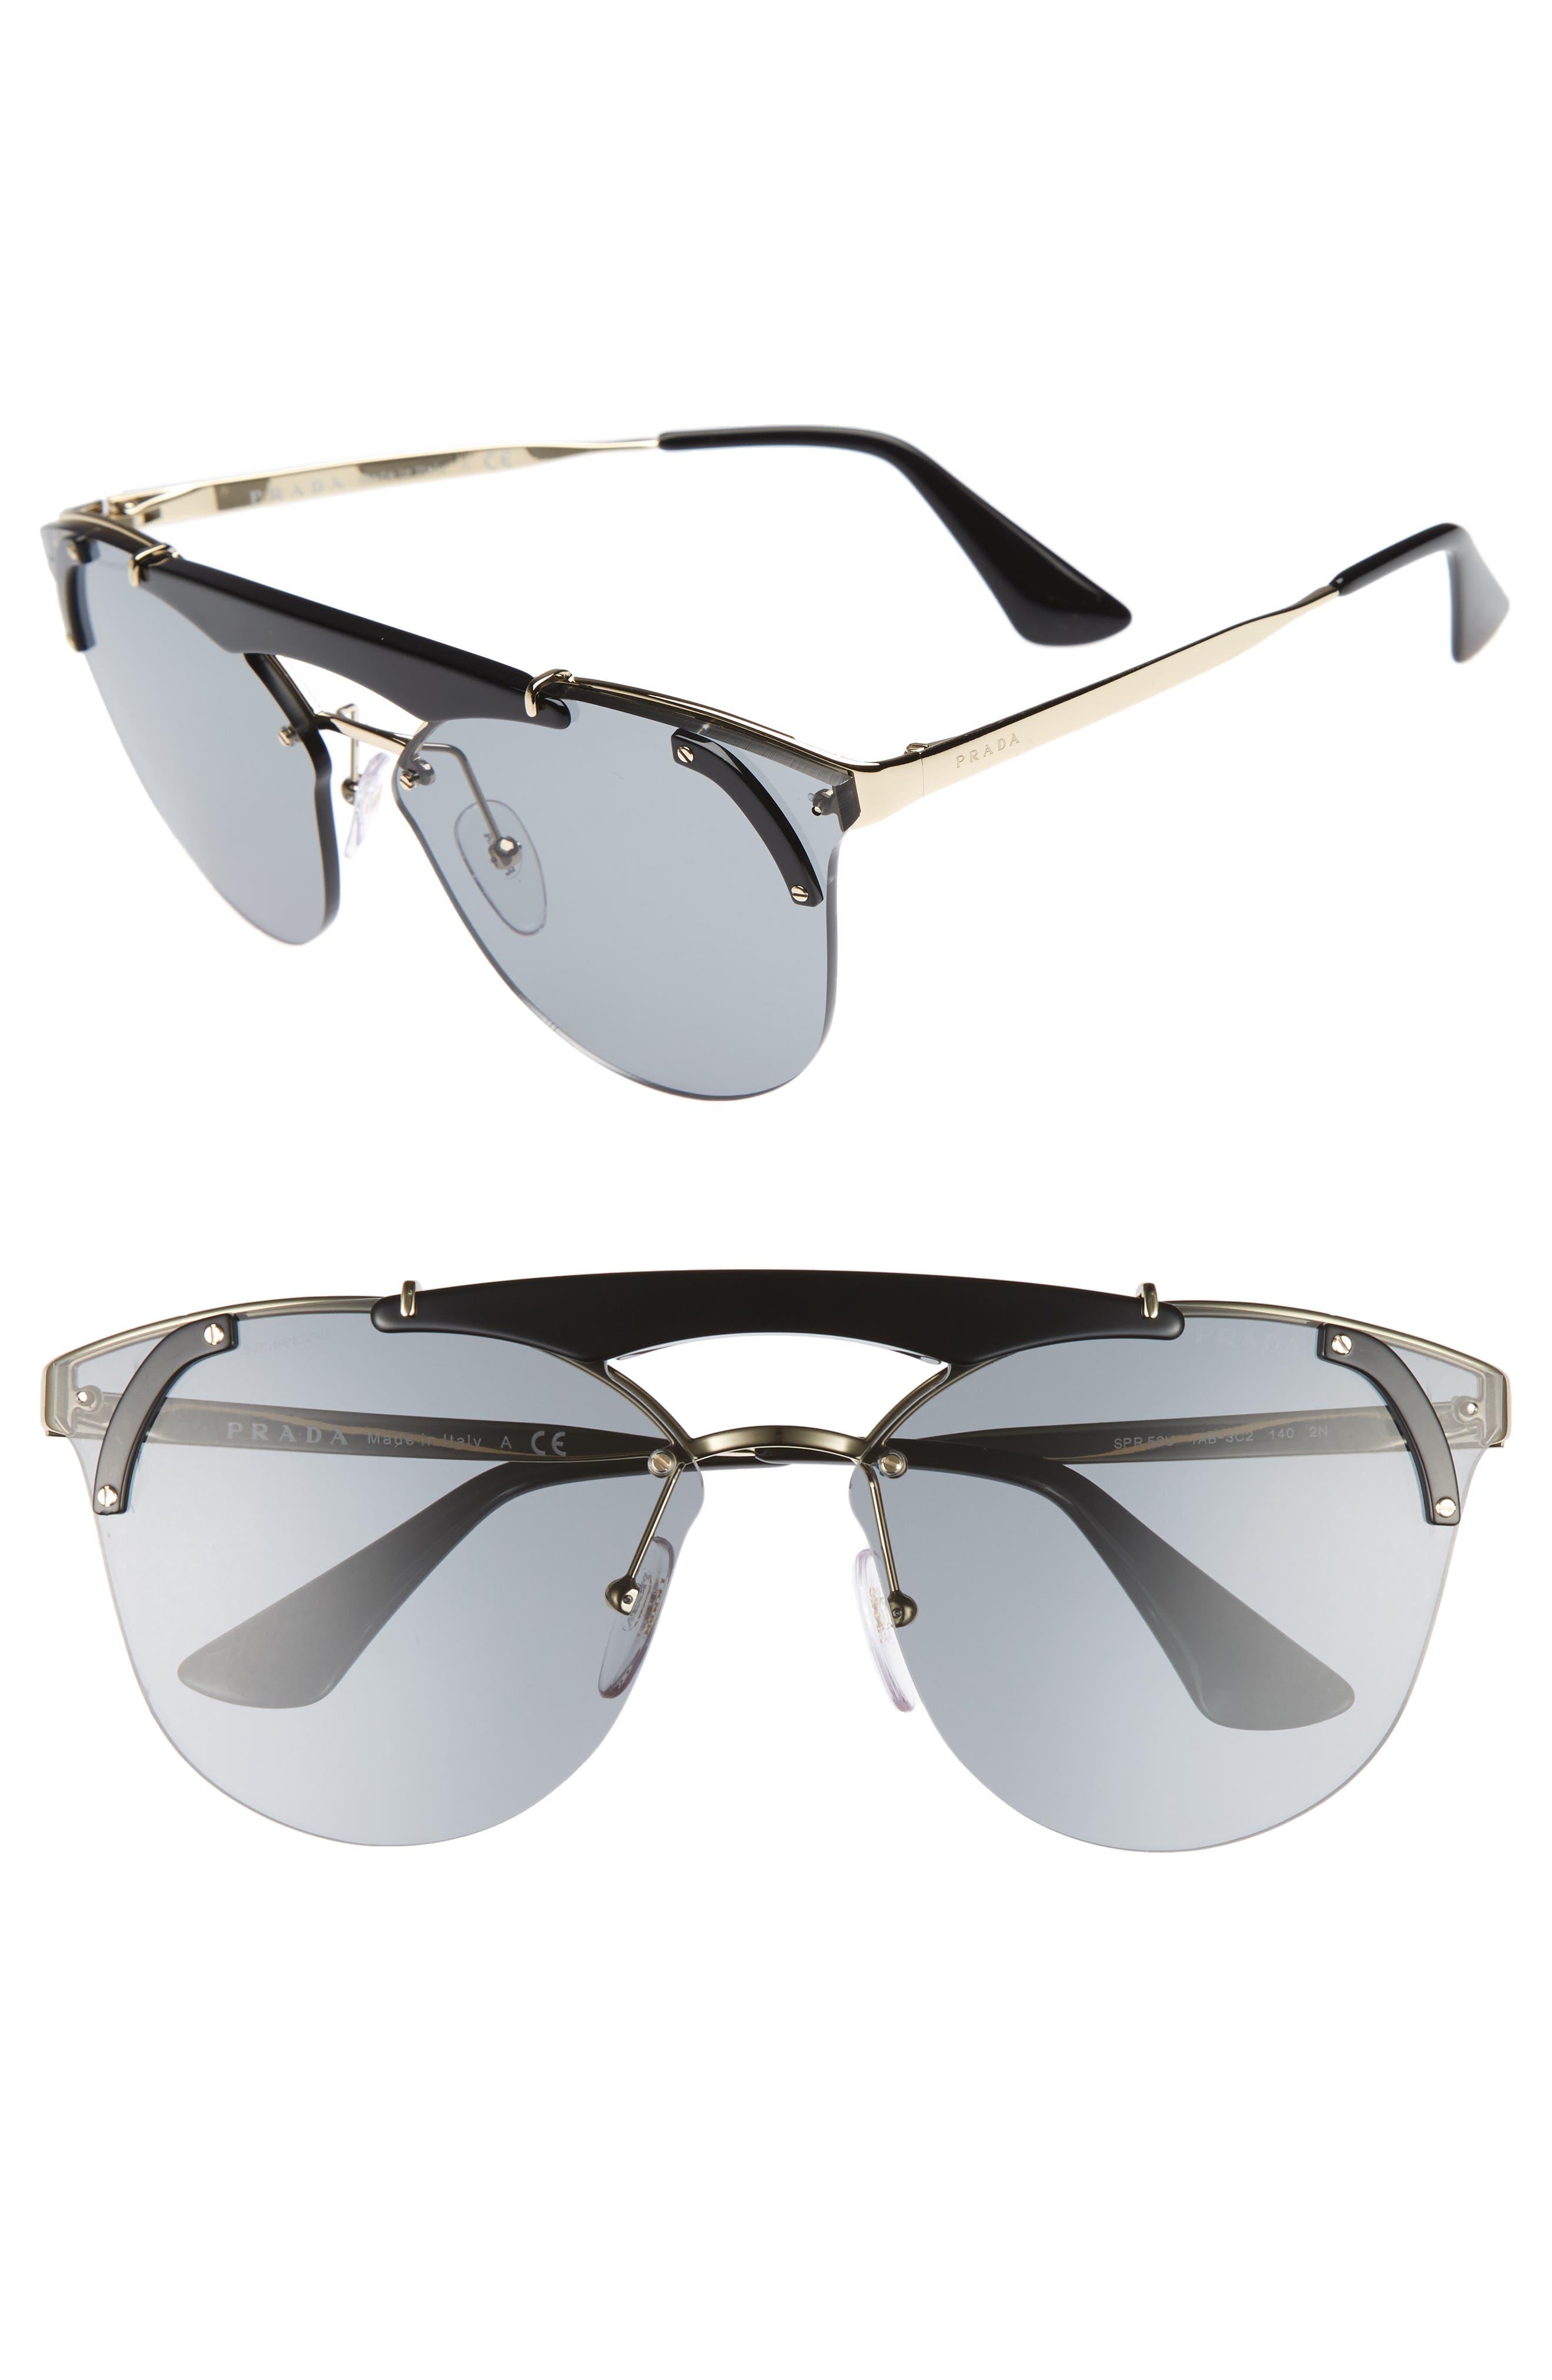 53mm Round Sunglasses,                             Main thumbnail 1, color,                             710